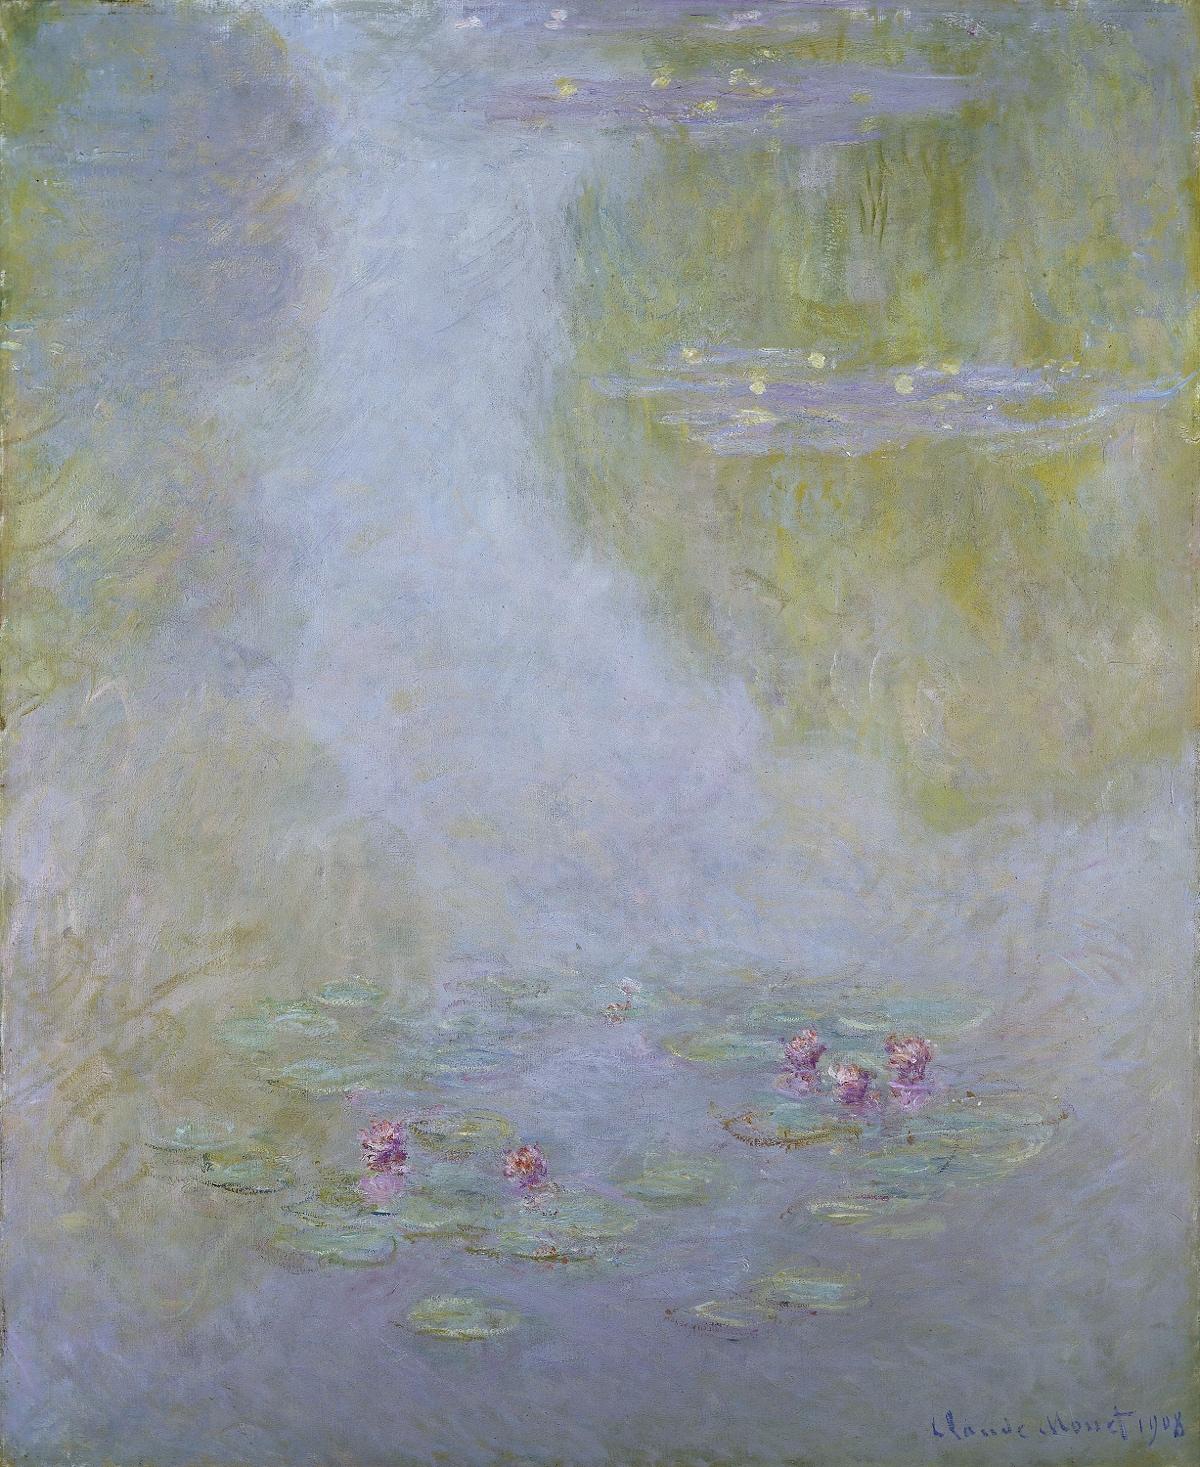 Blomsten i Kunsten. Claude Monet, Åkander, 1908. Amgueddfa Cymru – National Museum Wales. Testamentarisk arv fra Gwendoline Davies, 1951. Foto: National Museum Wales